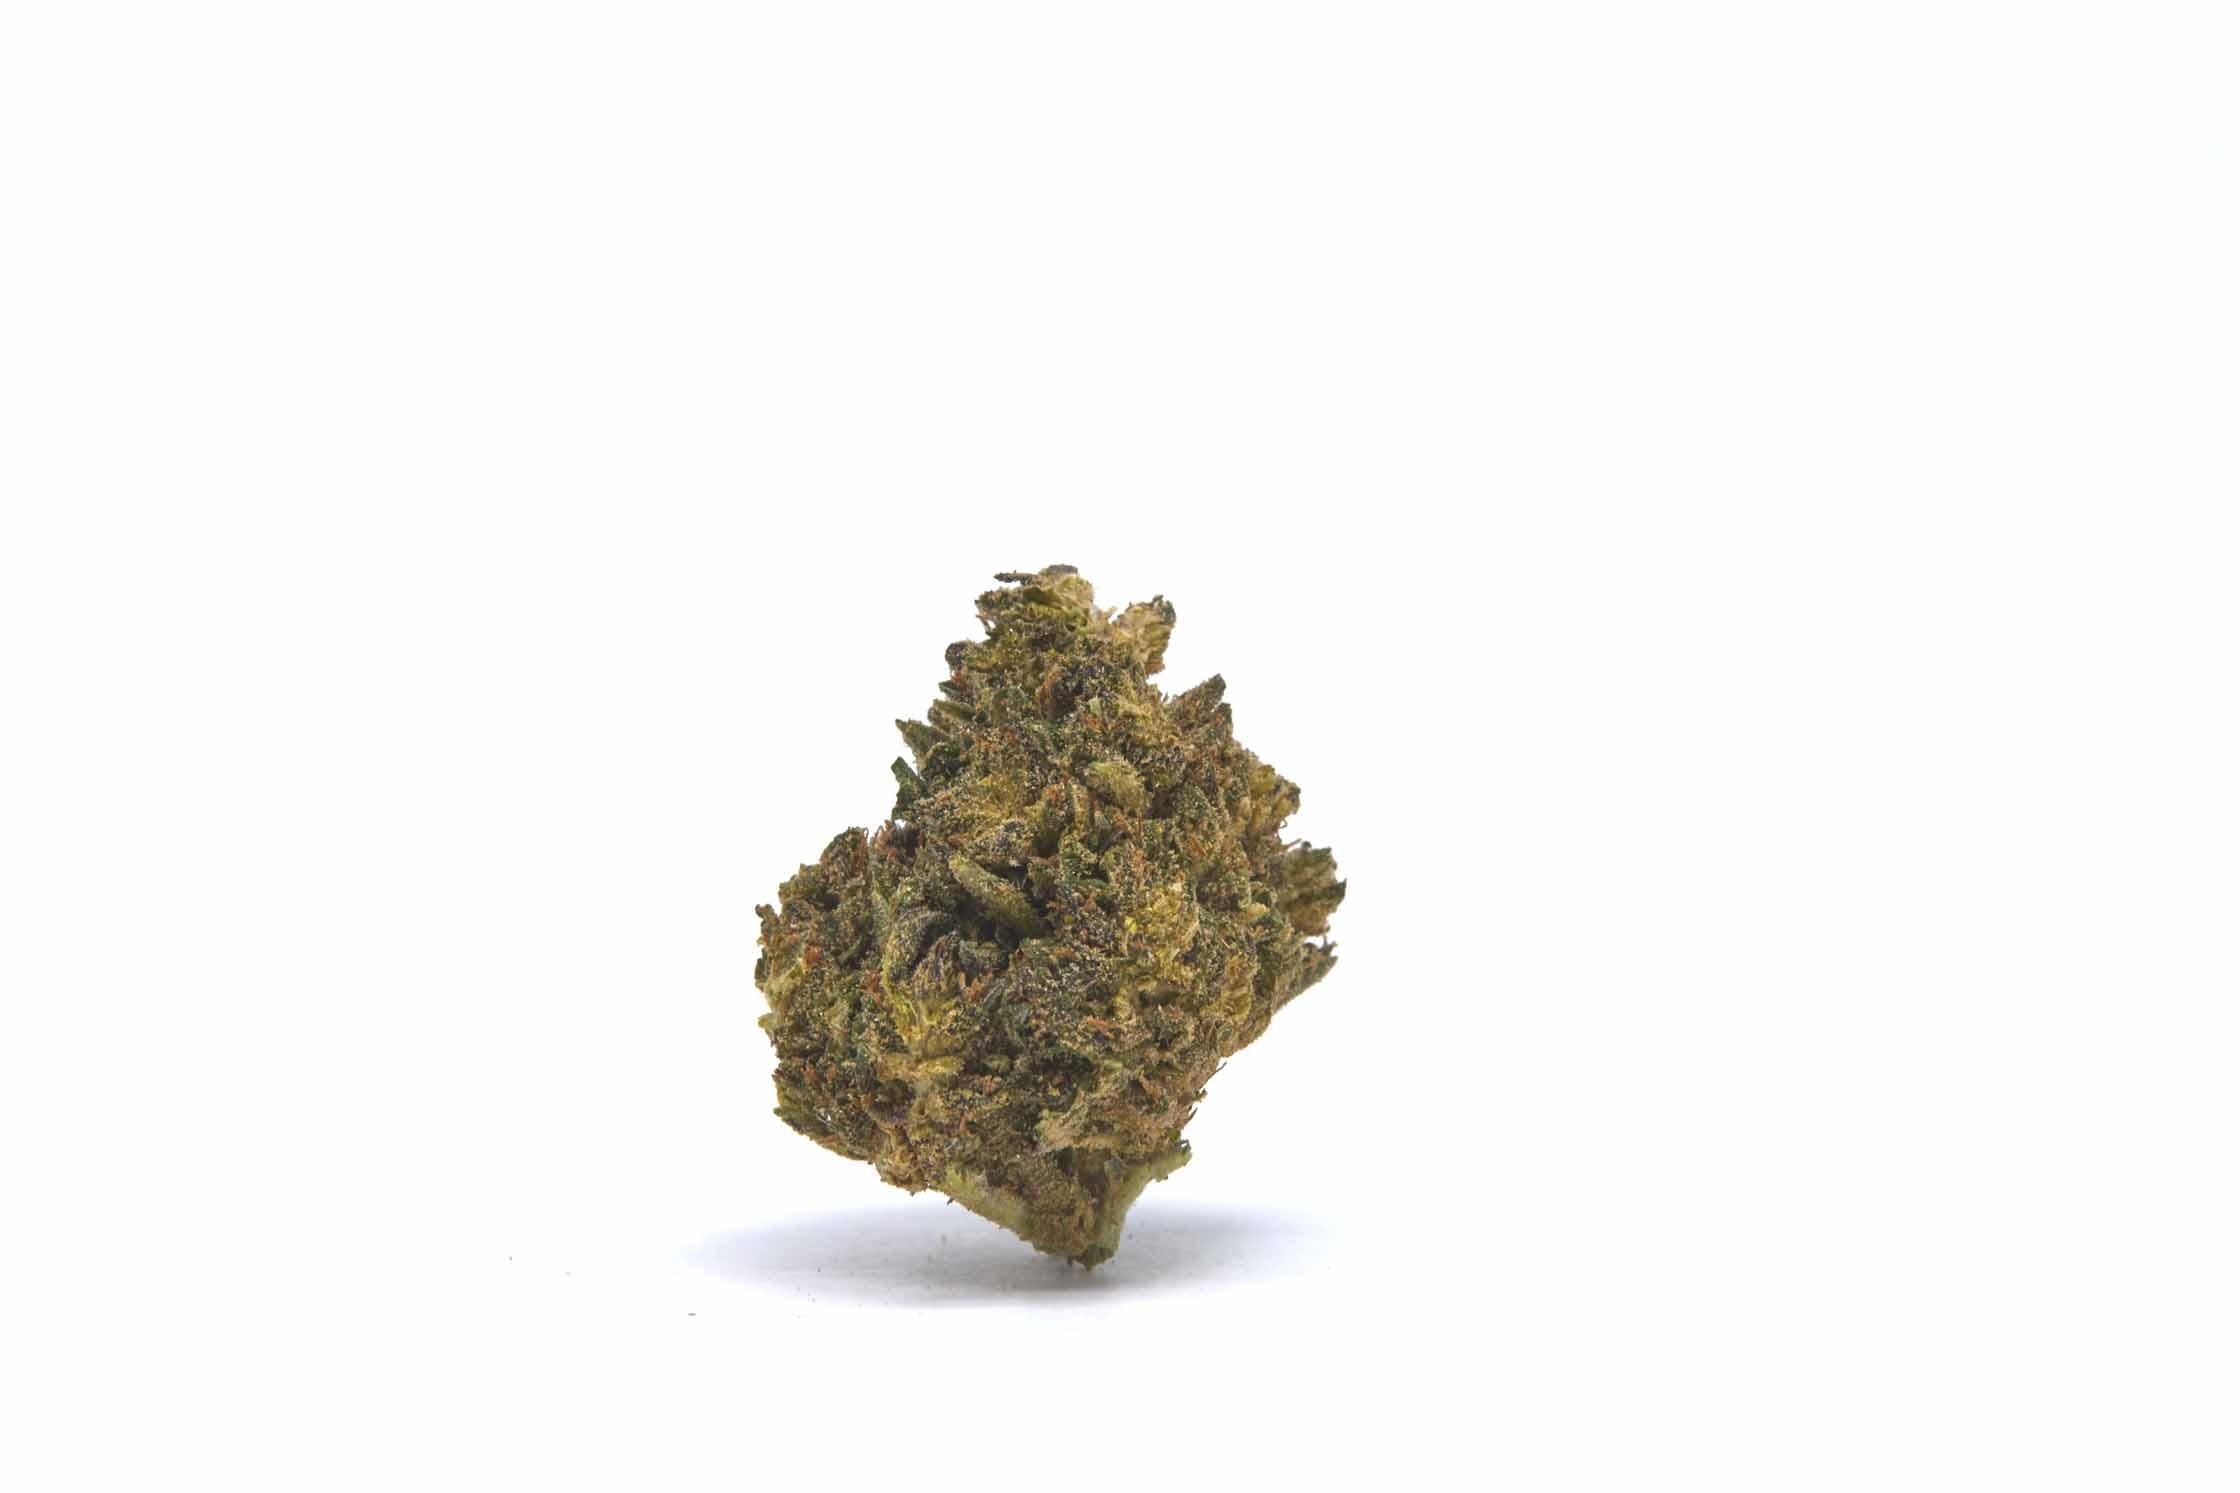 Apple Strudel CBD hemp flower for sale online